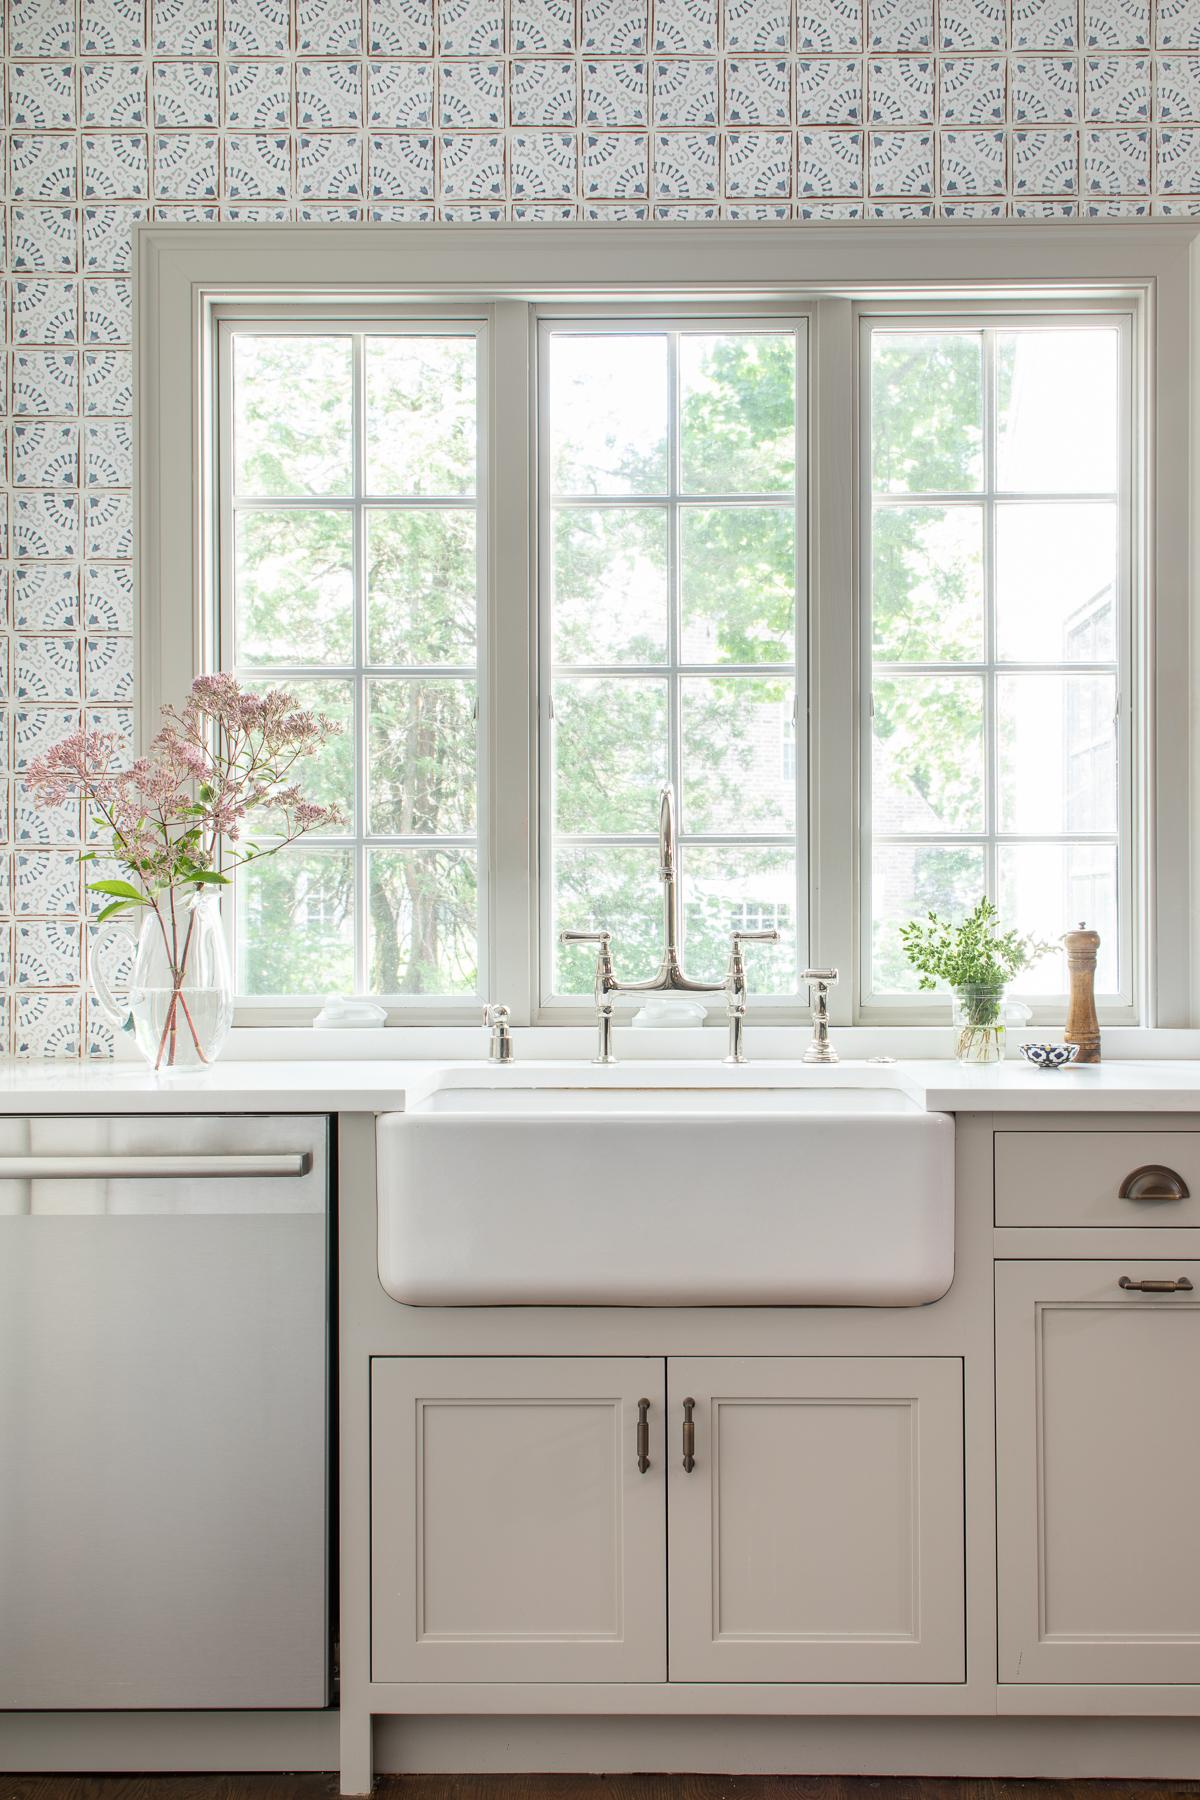 Milieu Home Goods